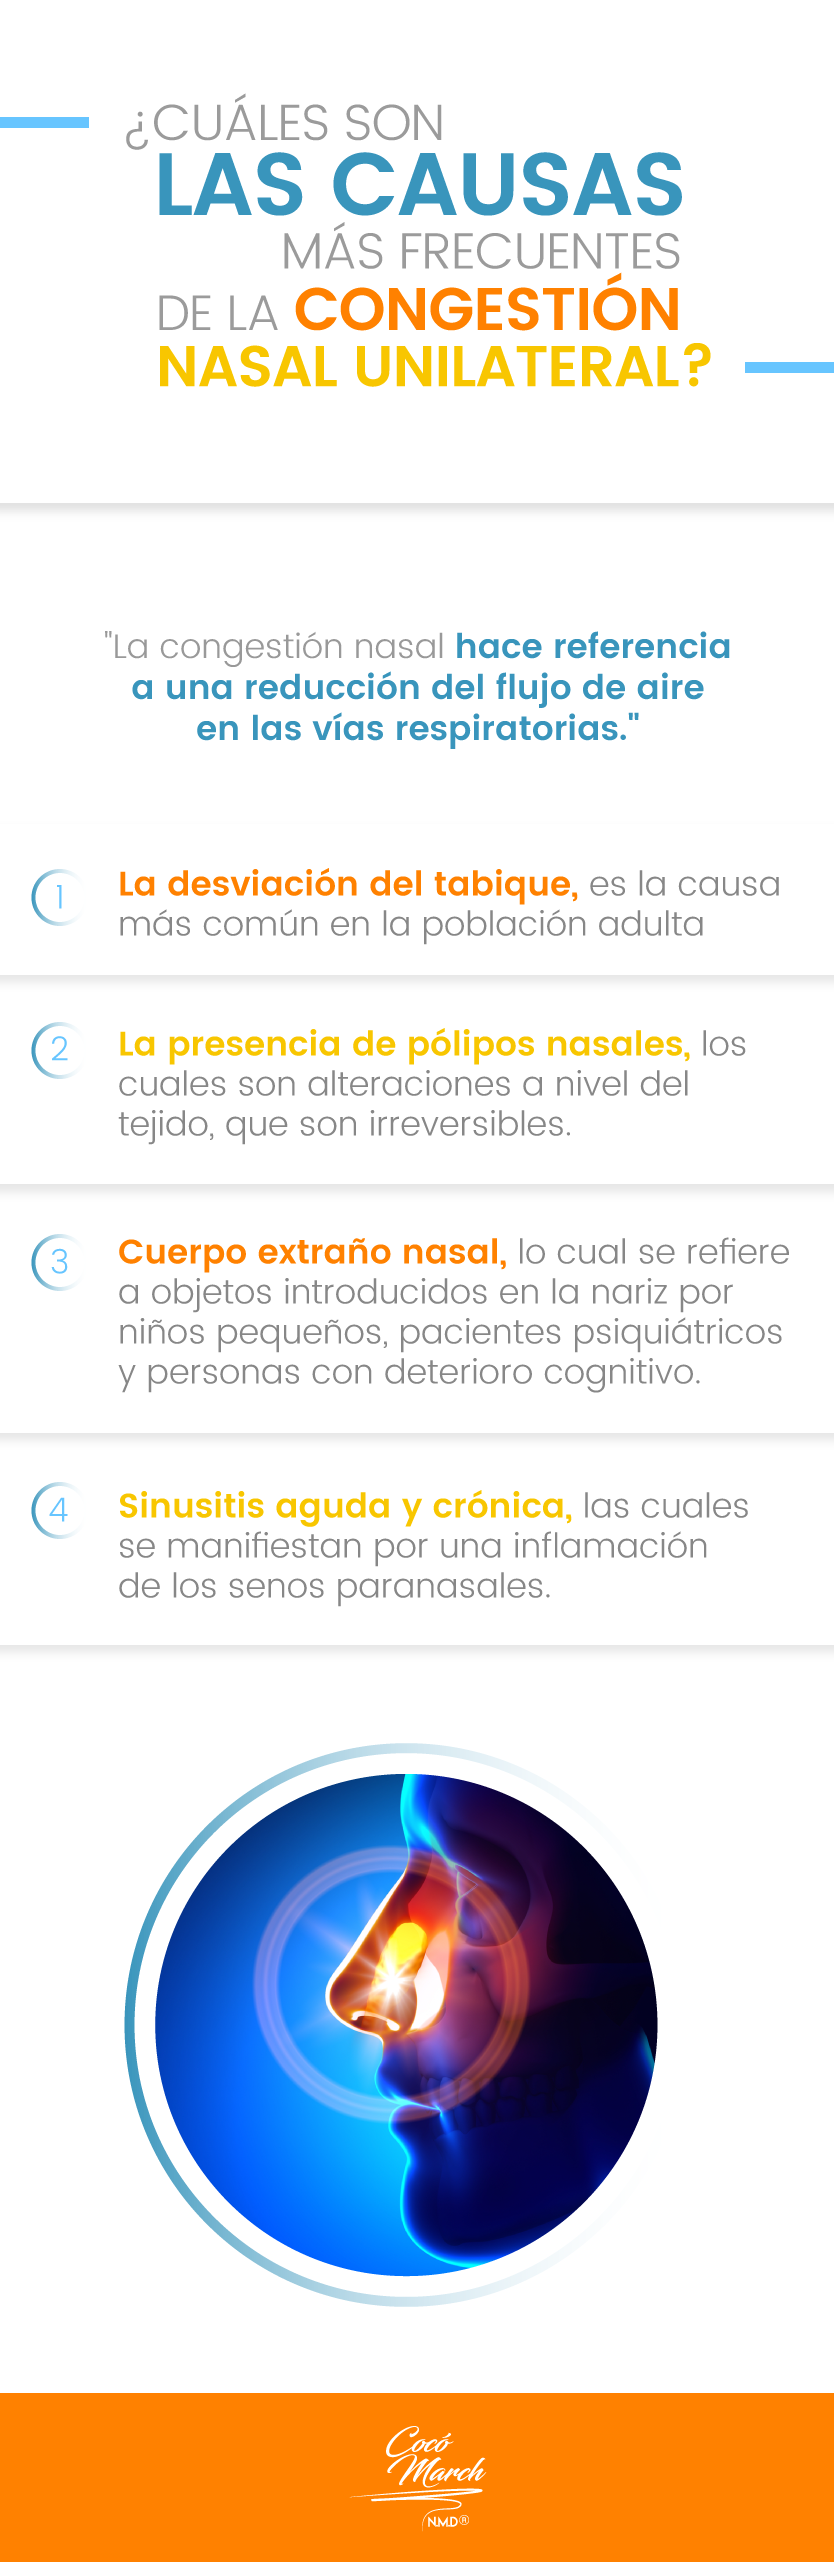 congestion-nasal-causas